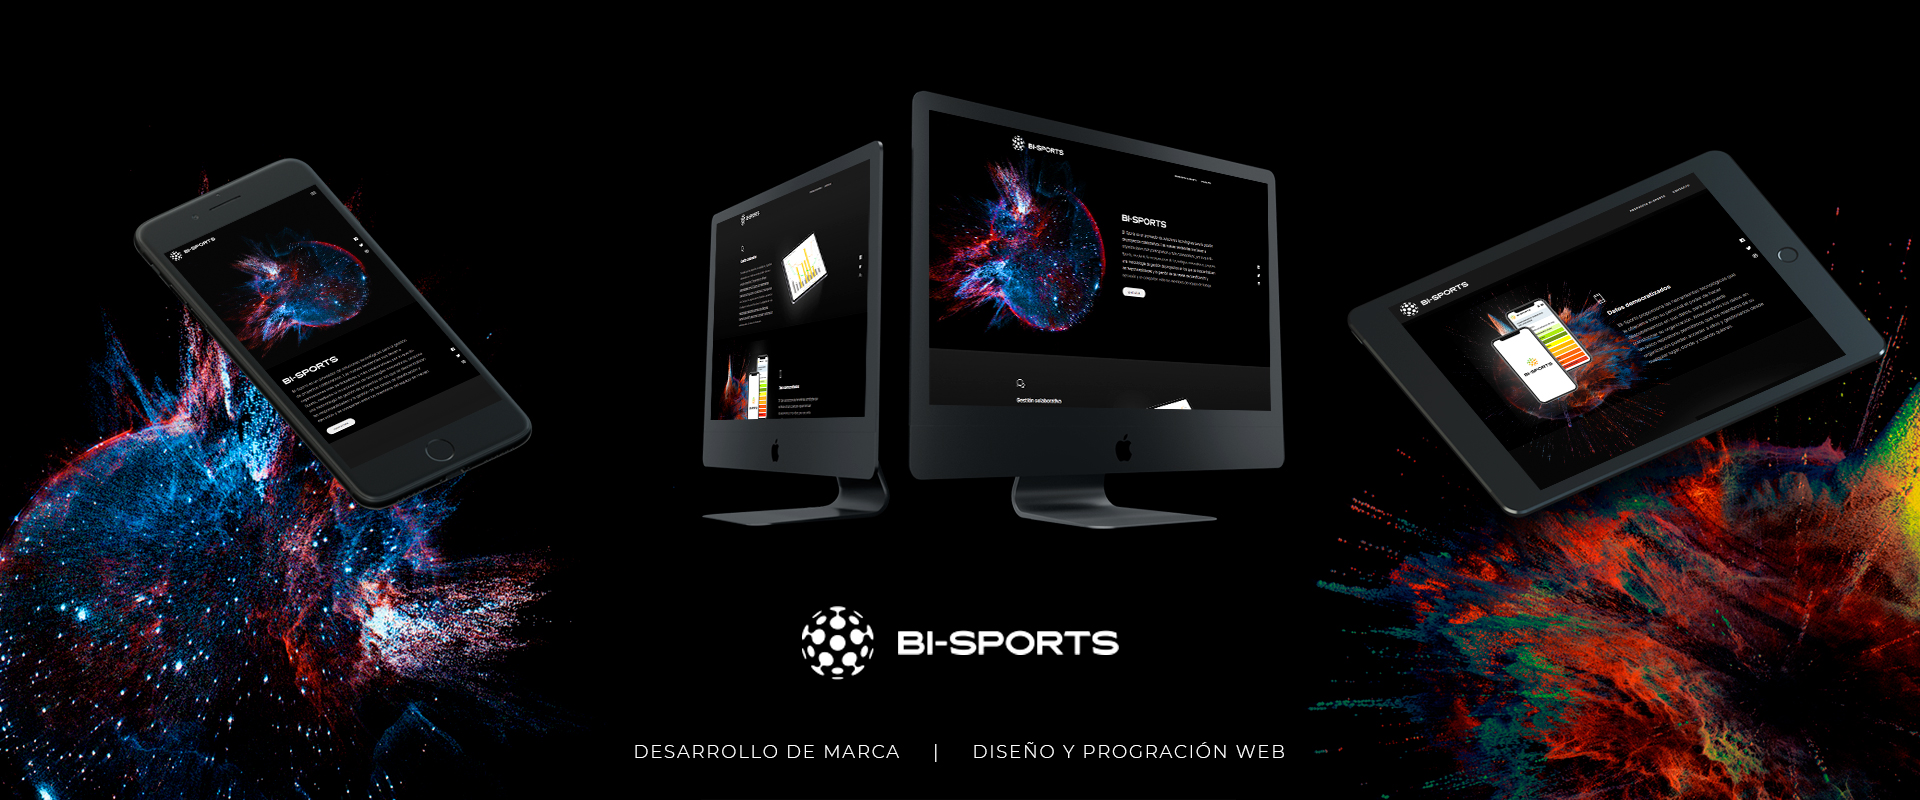 Bi-sports